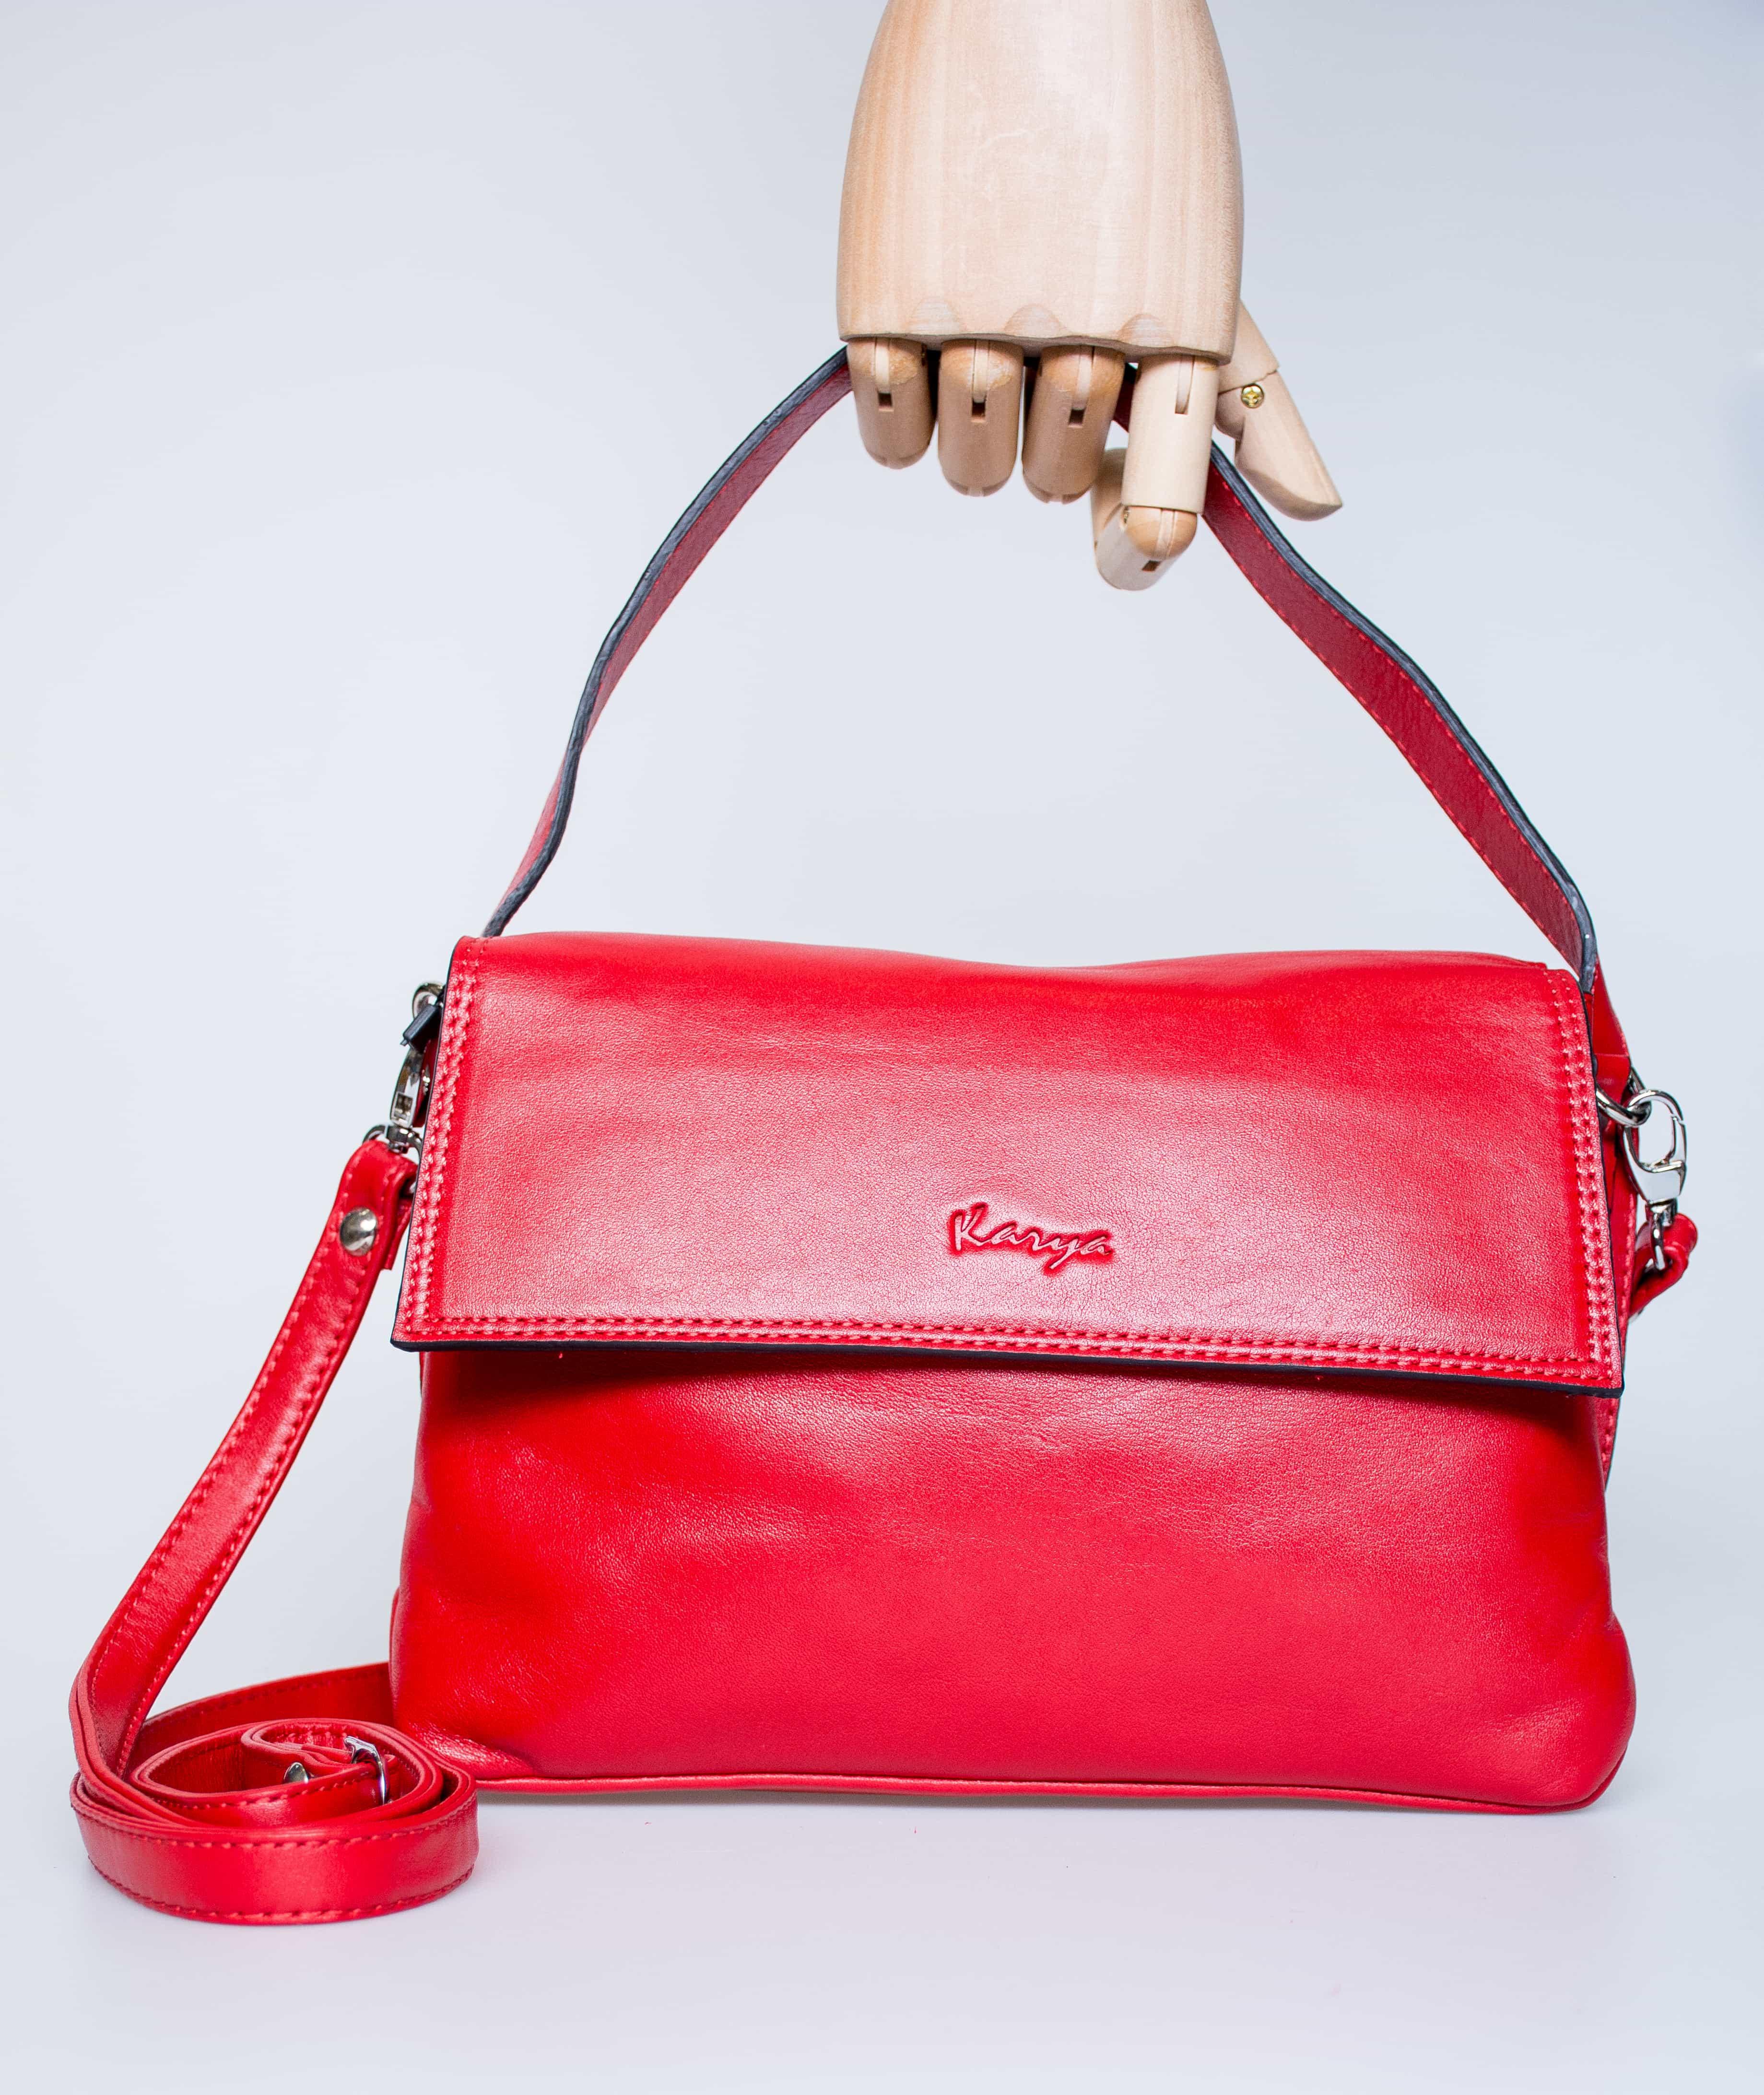 Женская кожаная сумка  KARYA 0768-46